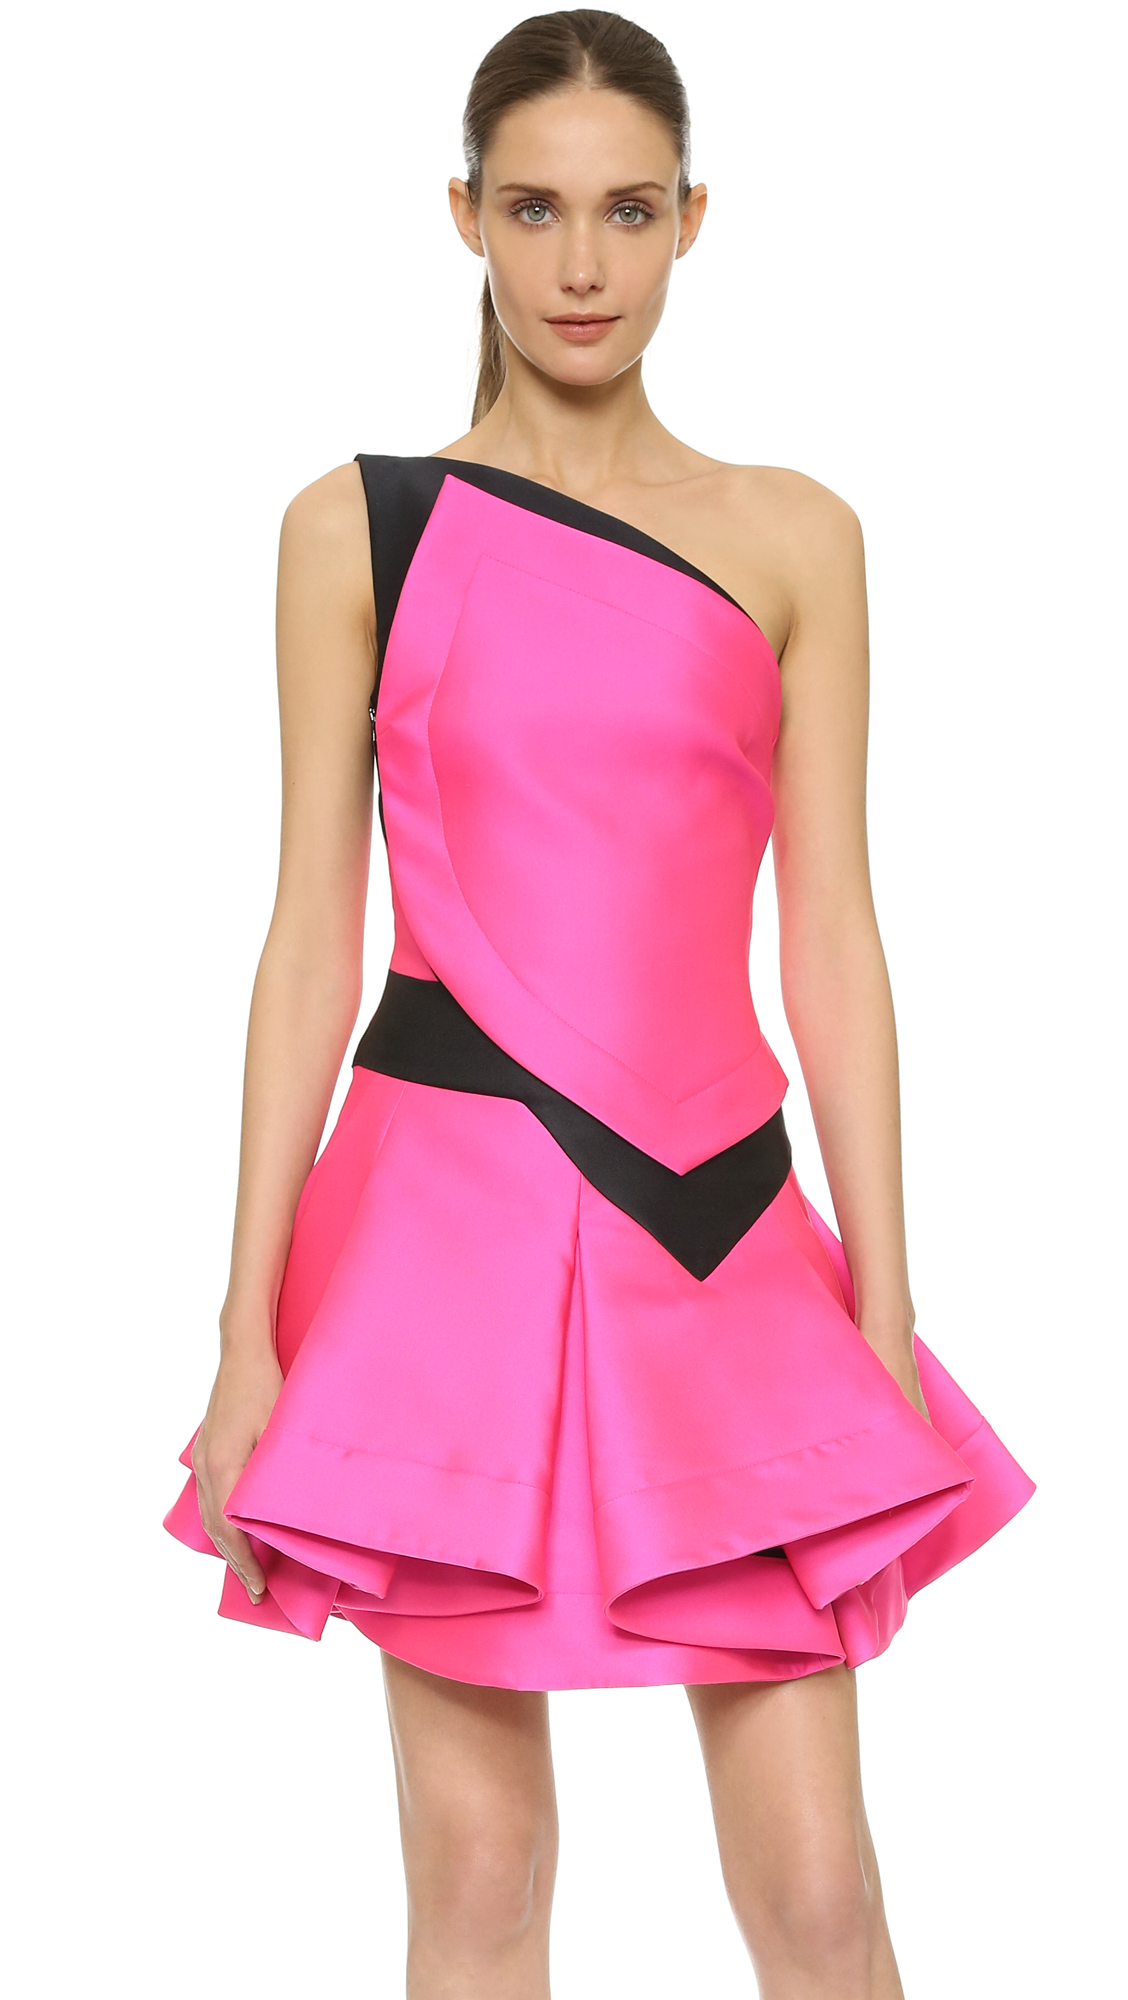 Antonio berardi One Shoulder Dress - Pink/black in Pink | Lyst